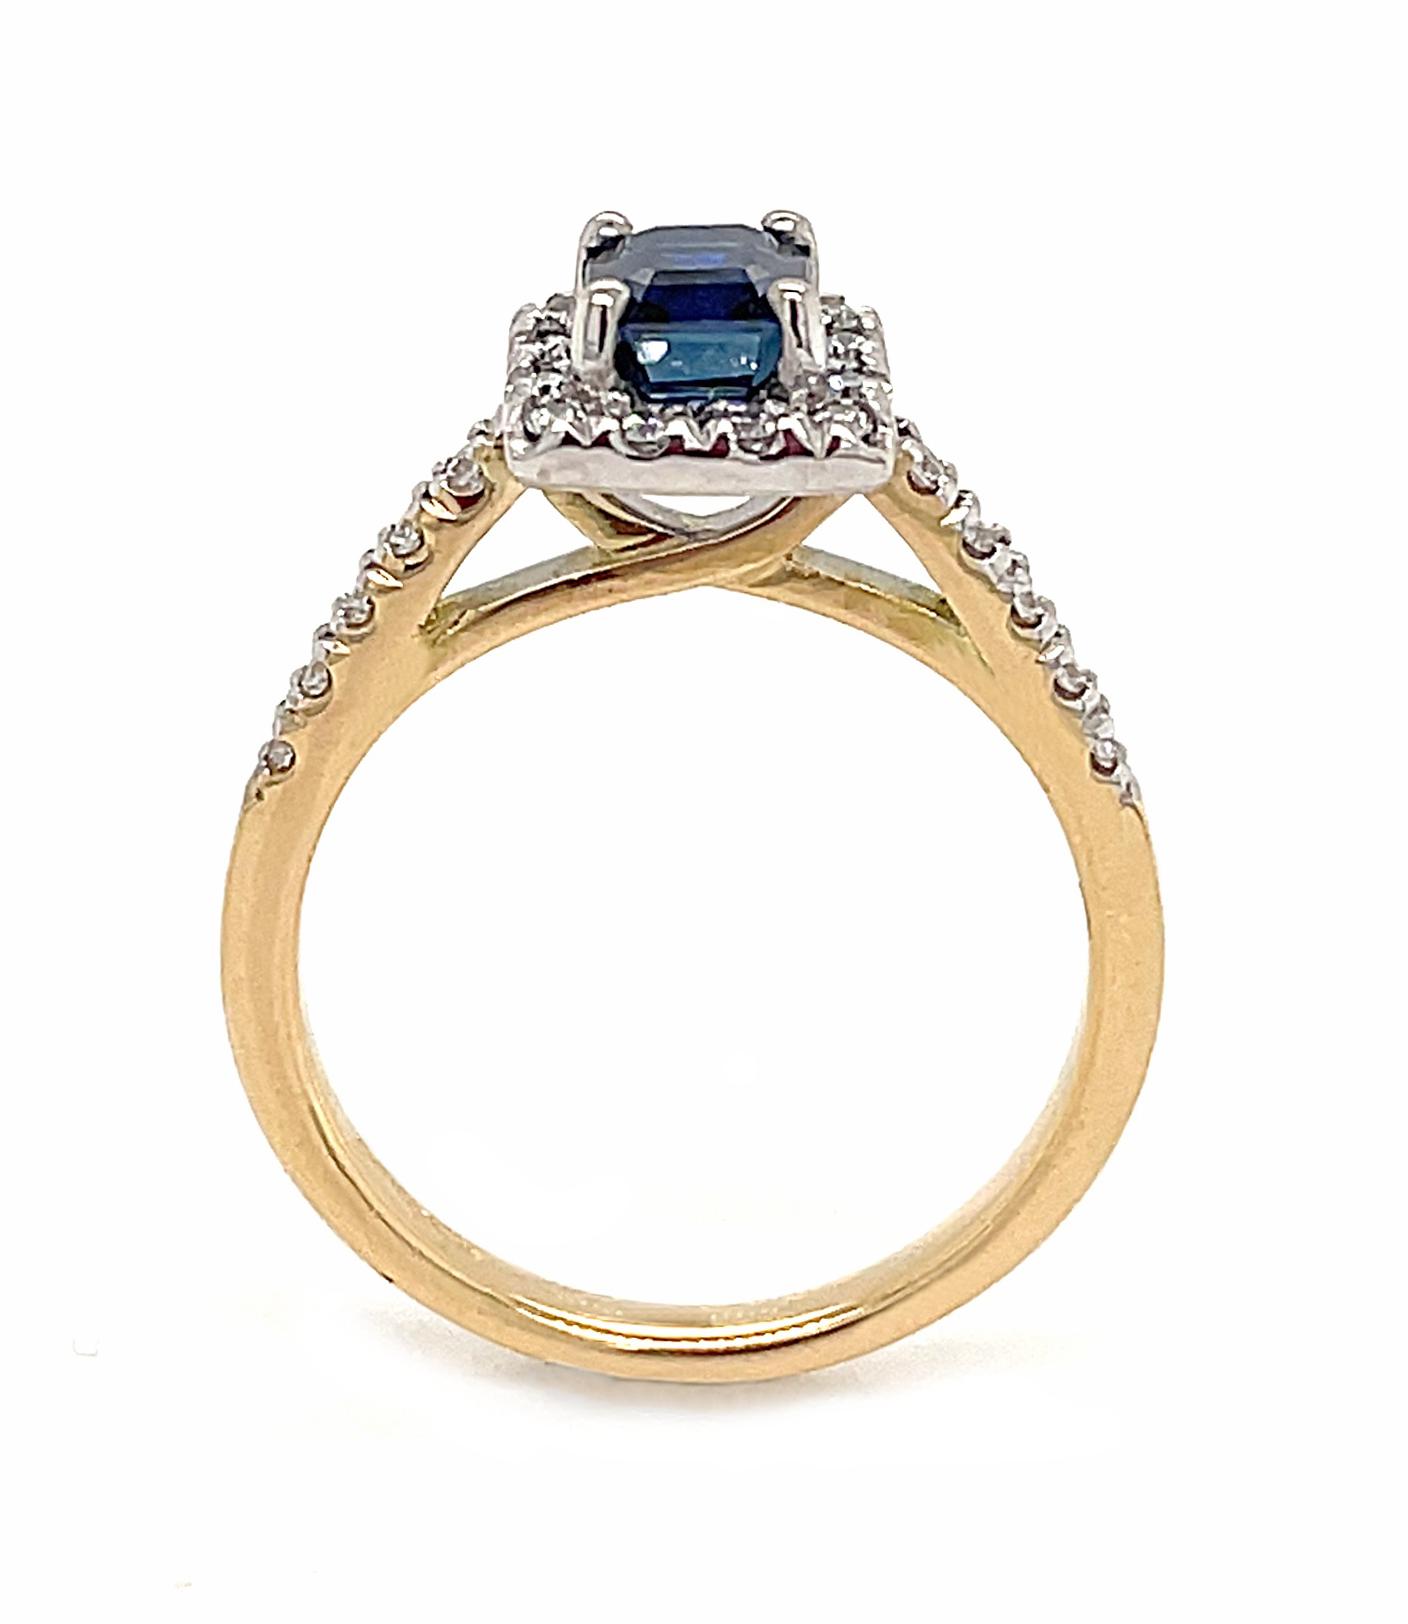 18k Yellow & White Gold Sapphire & Brilliant Cut Diamond Cluster Ring